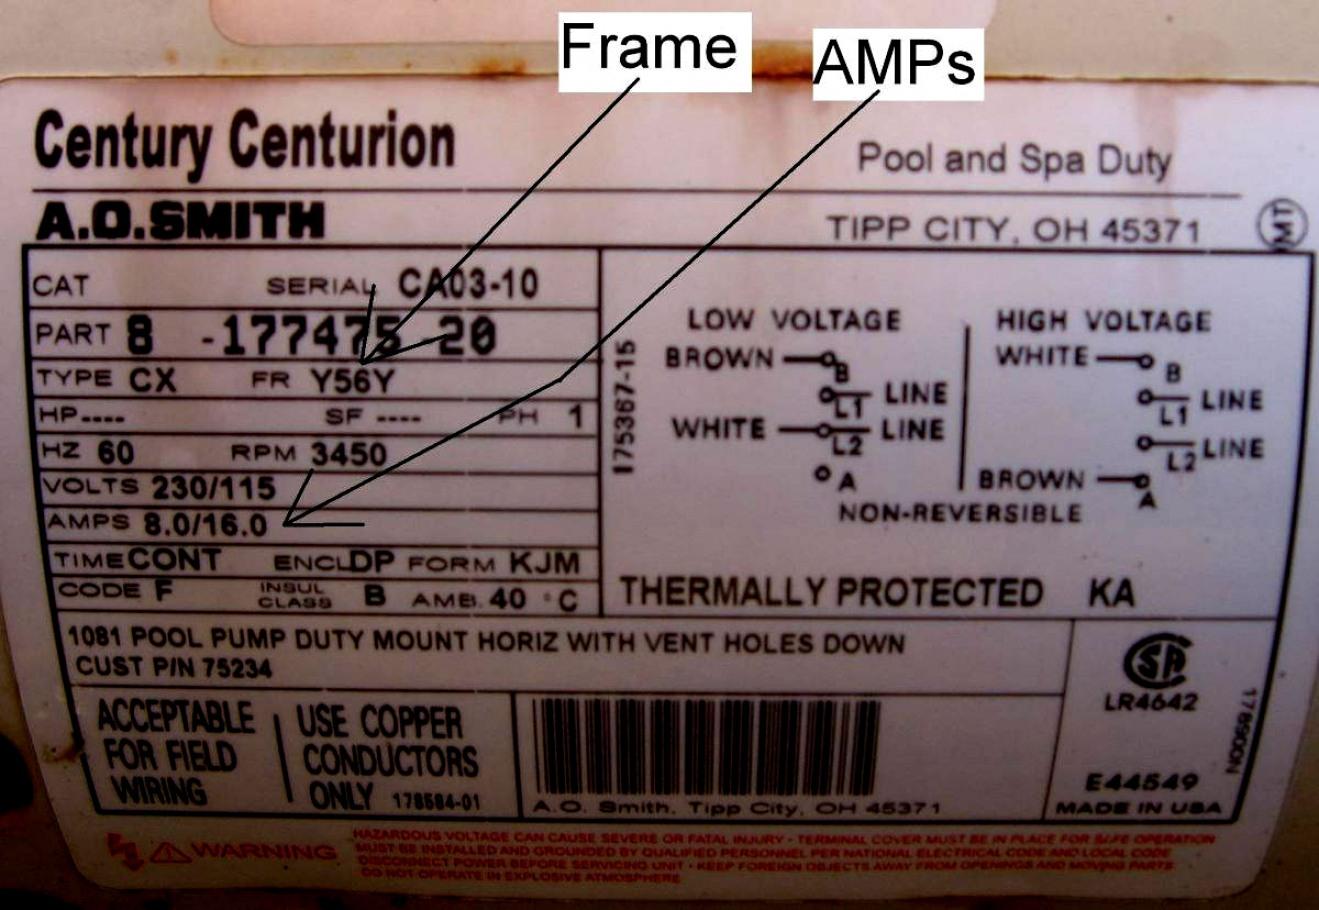 Wiring Diagram 115230 Motor Ao Smith - All Wiring Diagram Data - A.o.smith Motors Wiring Diagram